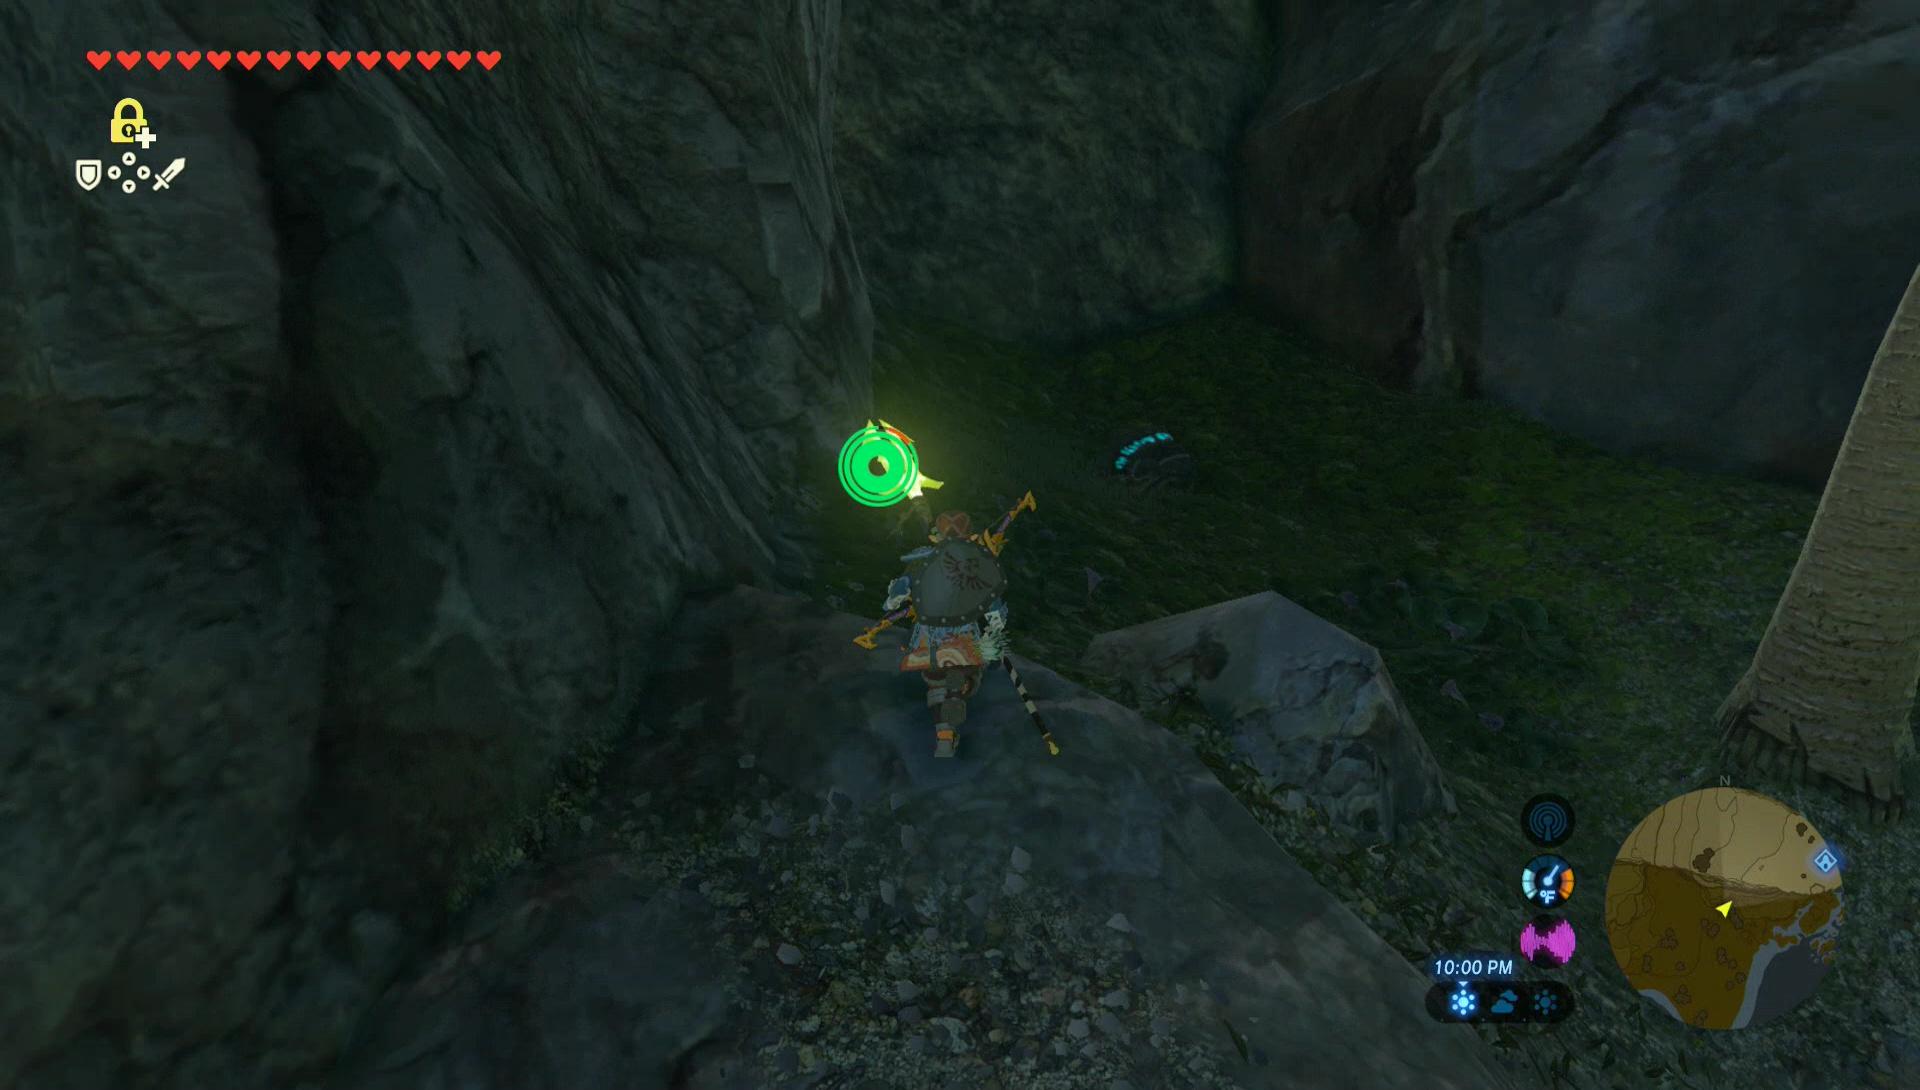 Kah Yah Shrine Guide - Zelda Dungeon